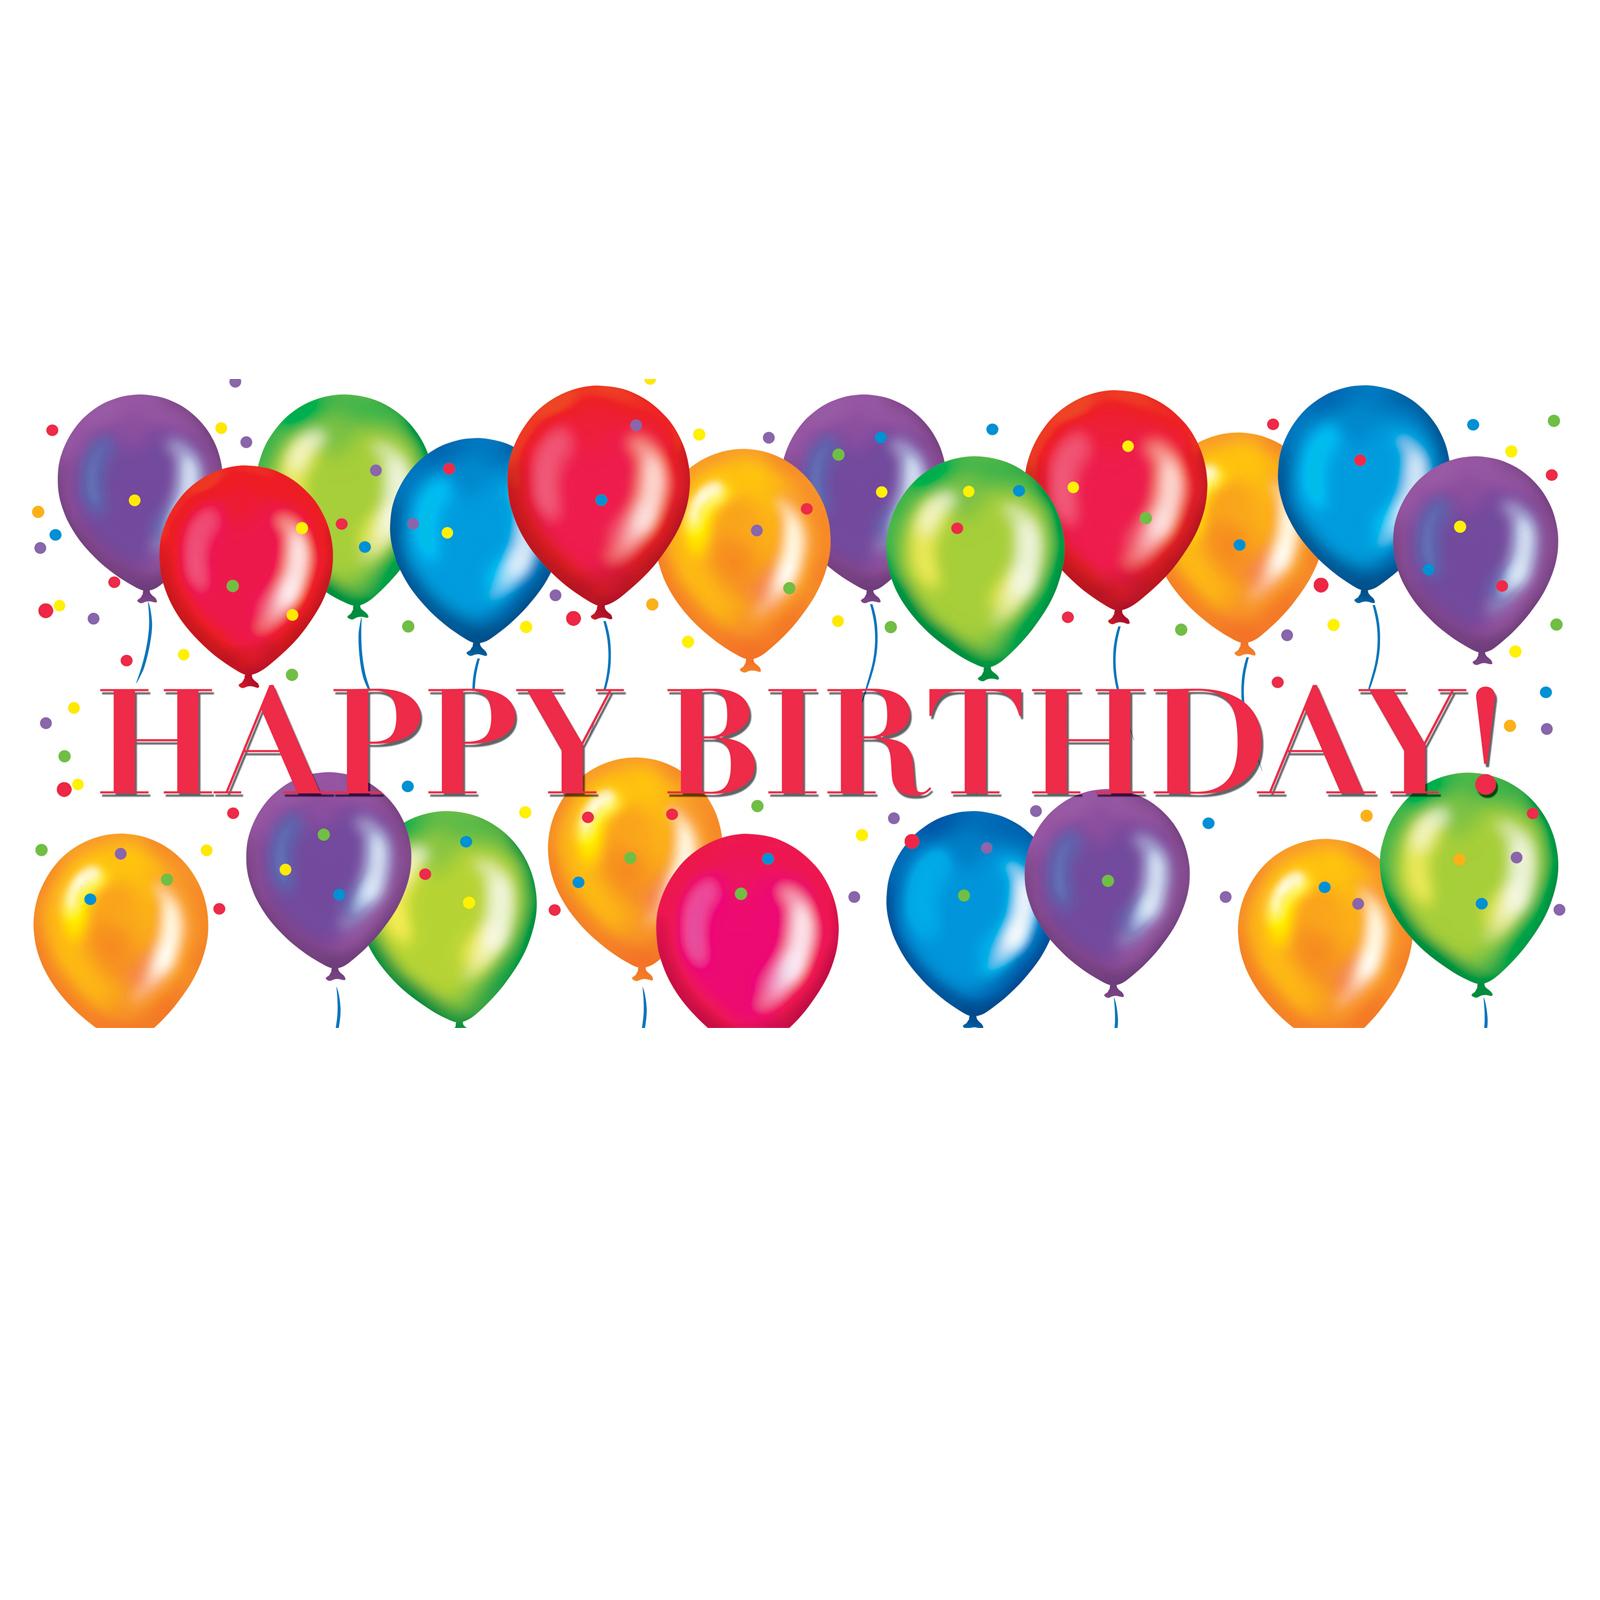 happy birthday davep  oct 15